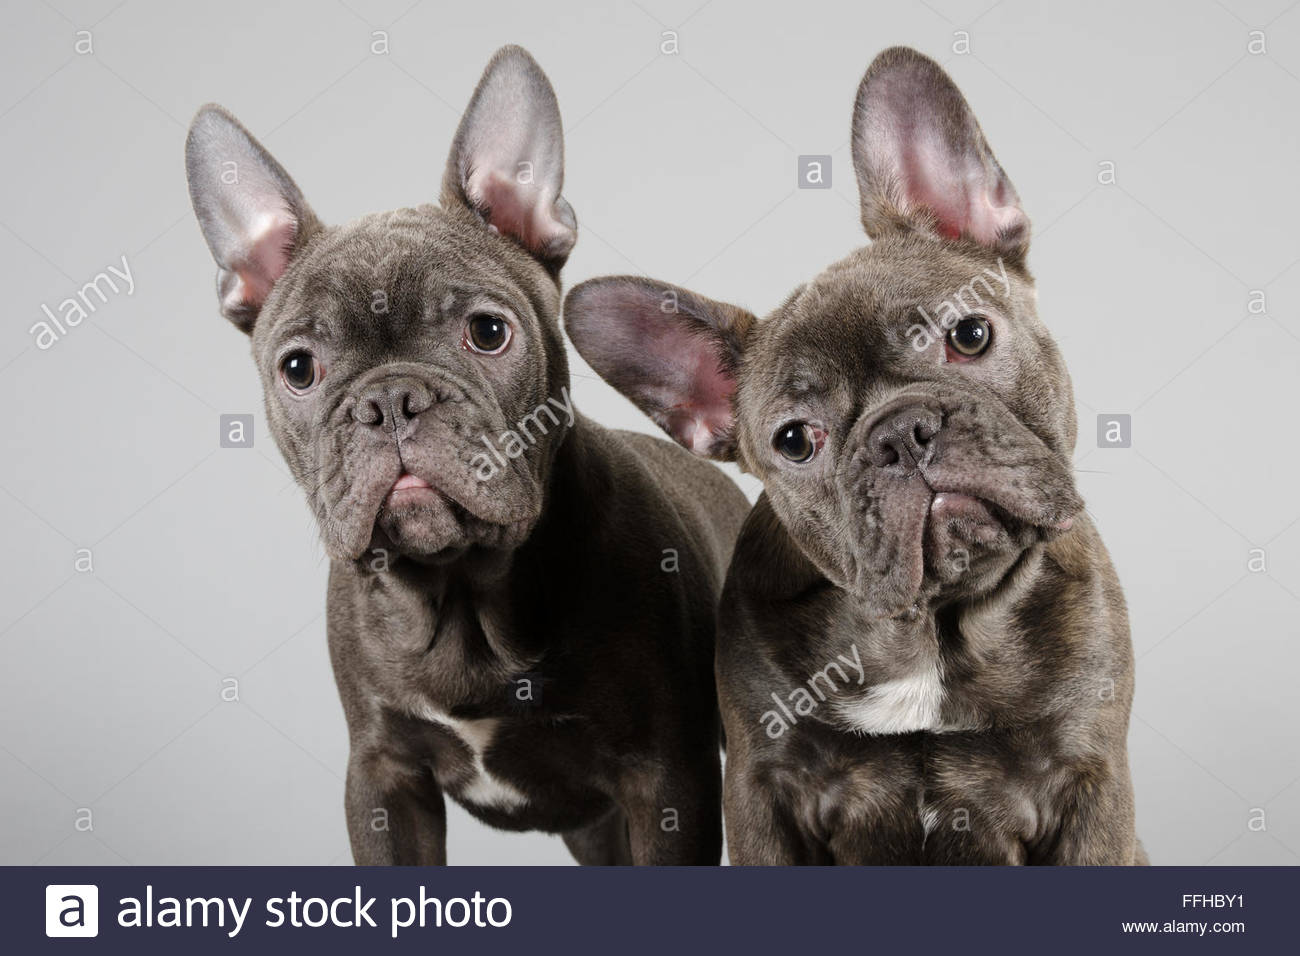 french-bulldog-pups-FFHBY1.jpg